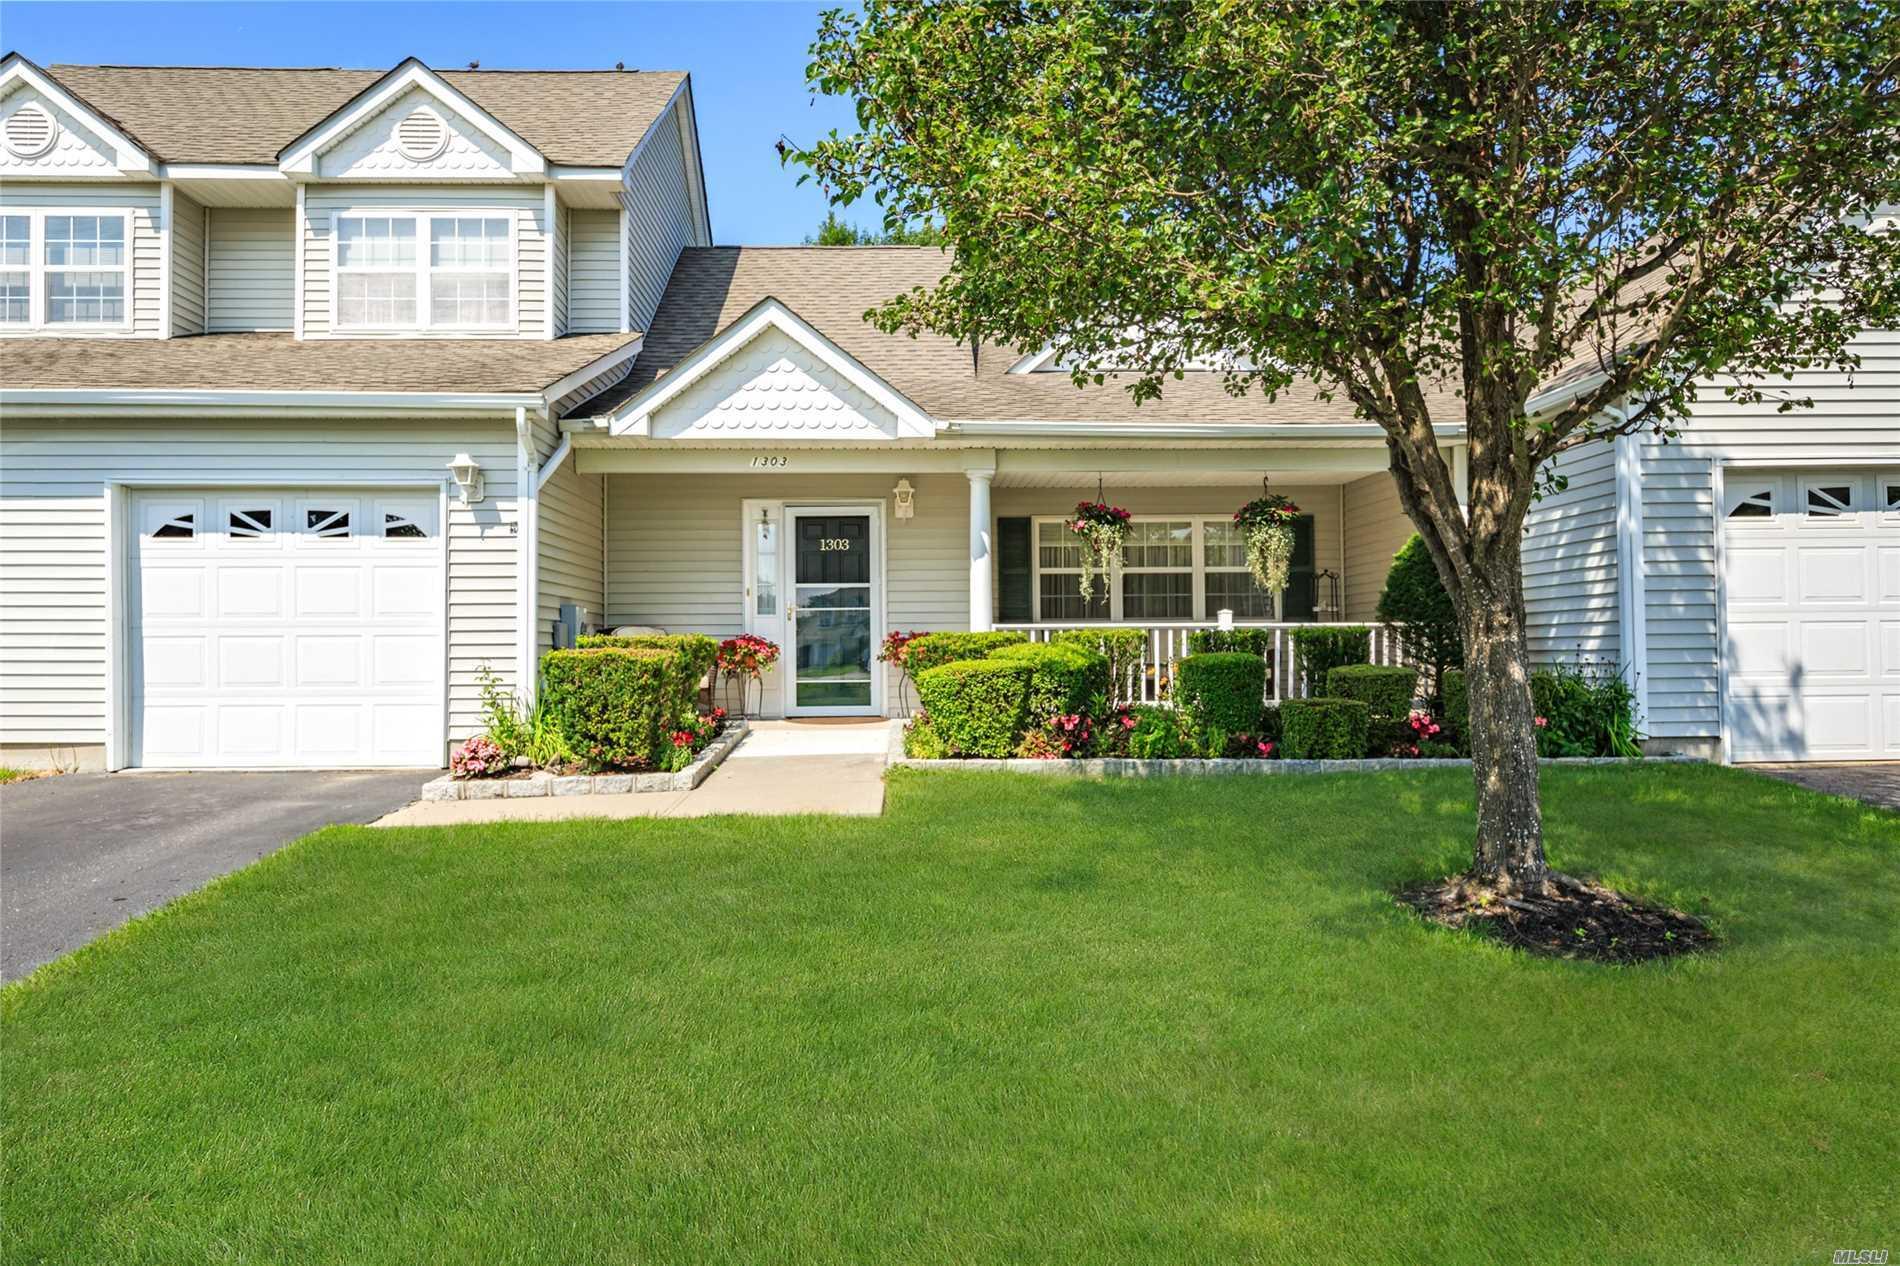 Property for sale at 1303 Baltusrol Blvd, Riverhead,  NY 11901